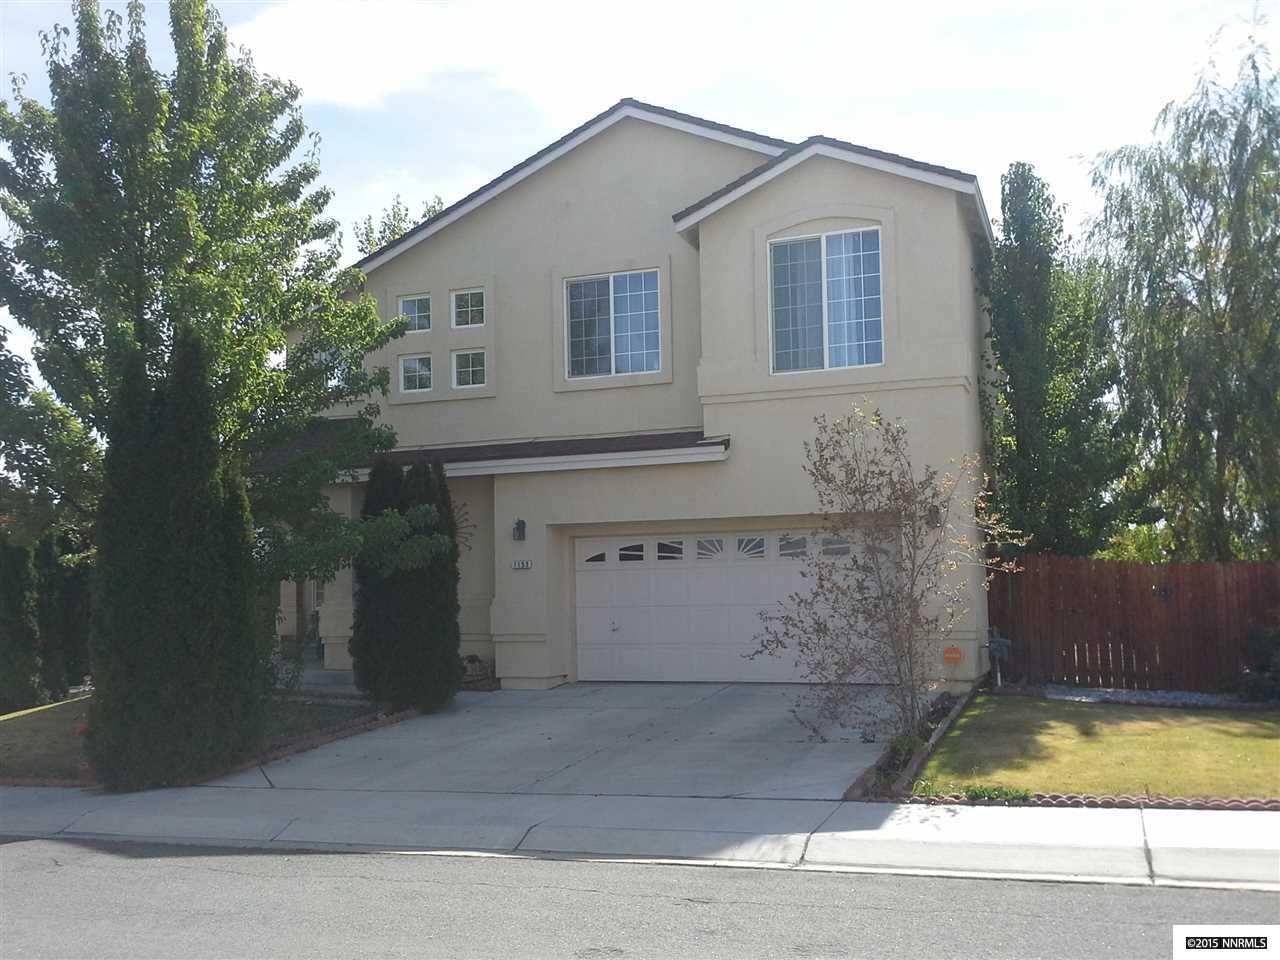 1153 Ridgefield Dr, Carson City, NV